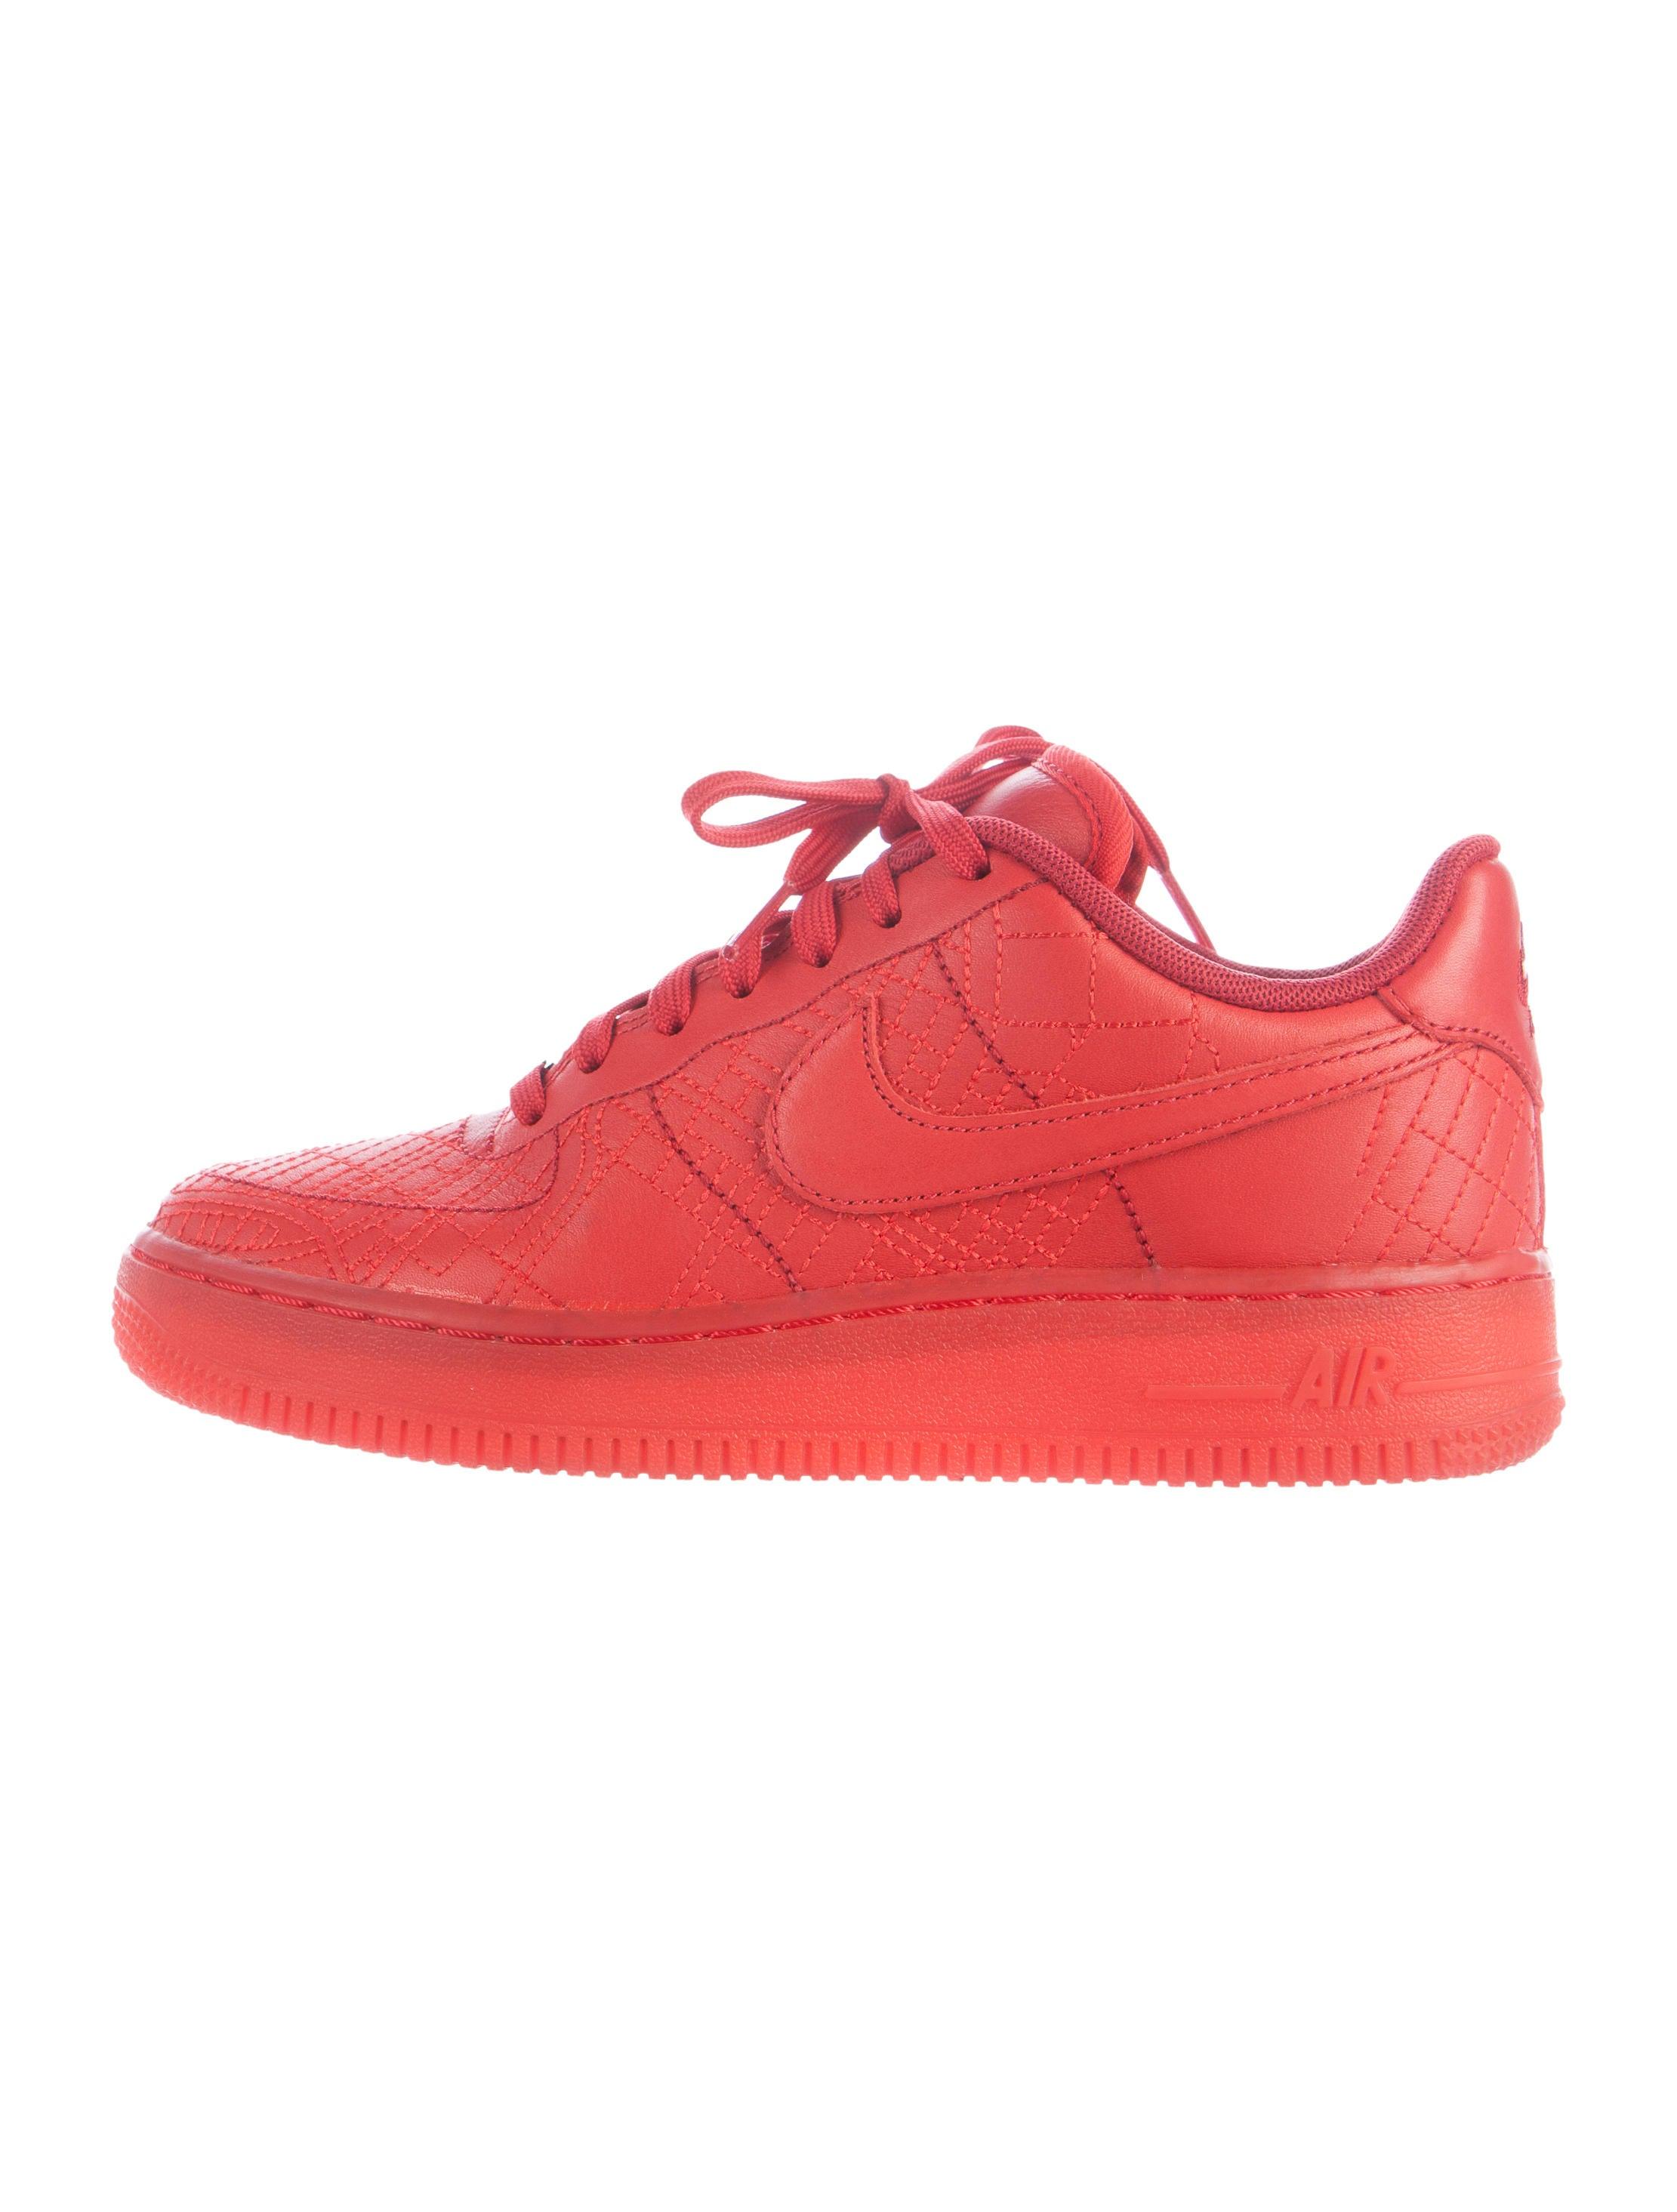 Nike Air Force 1 City Pack Tokyo